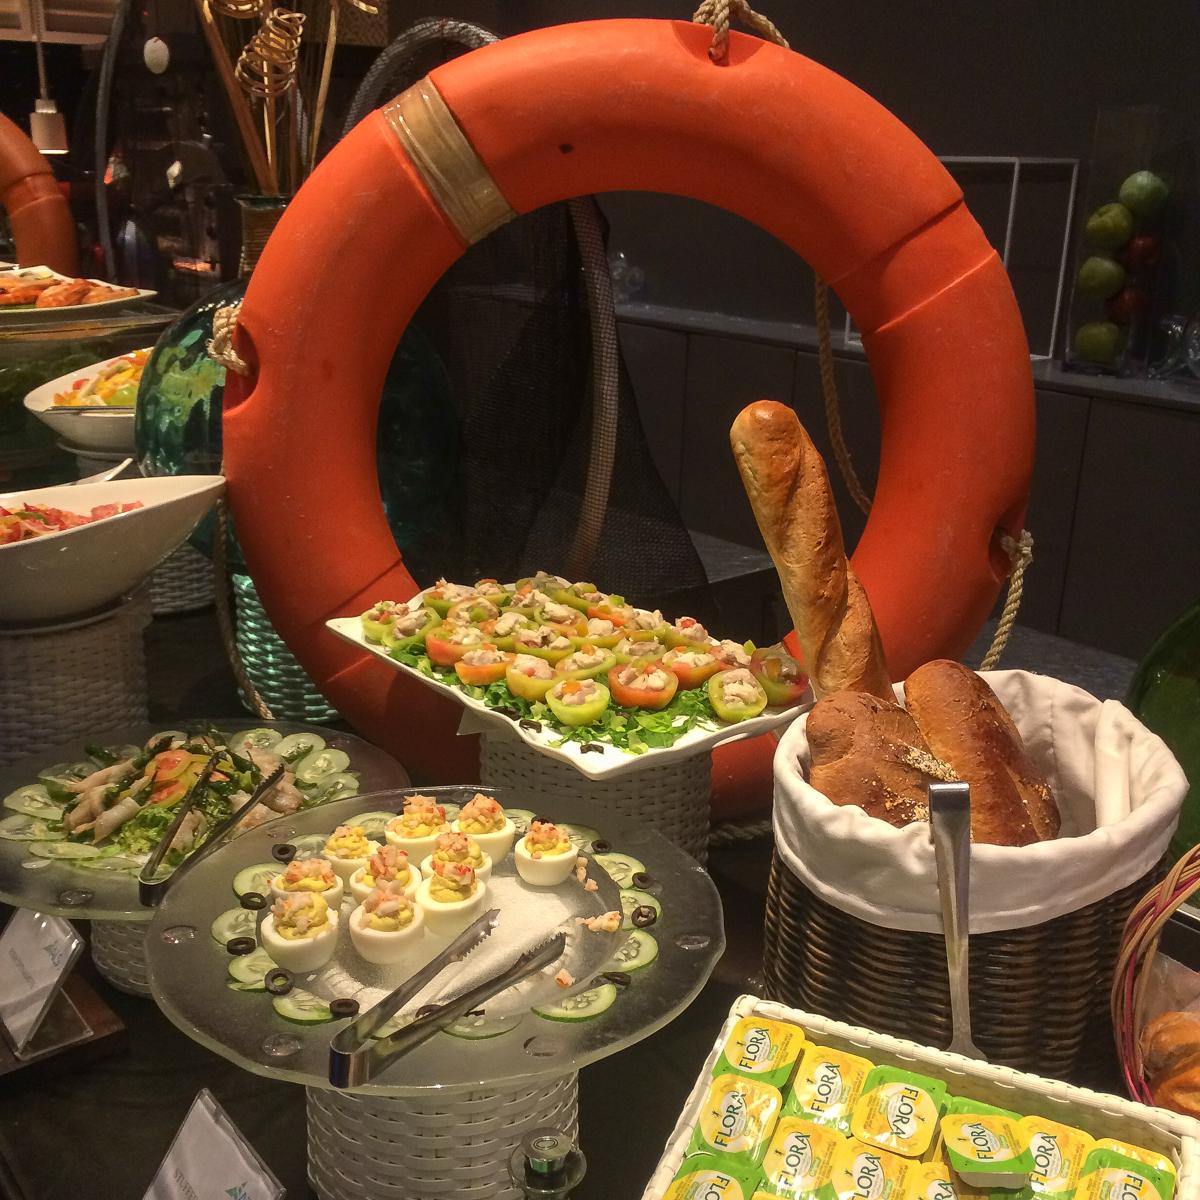 Cebu Blogger, Movenpick Hotel Mactan Island Cebu, Swissmas Holiday, Toni Pino-Oca, Cebu Fashion Blogger, Cebu Lifestyle Blog, Cebu Food Blog, The Sails Restaurant